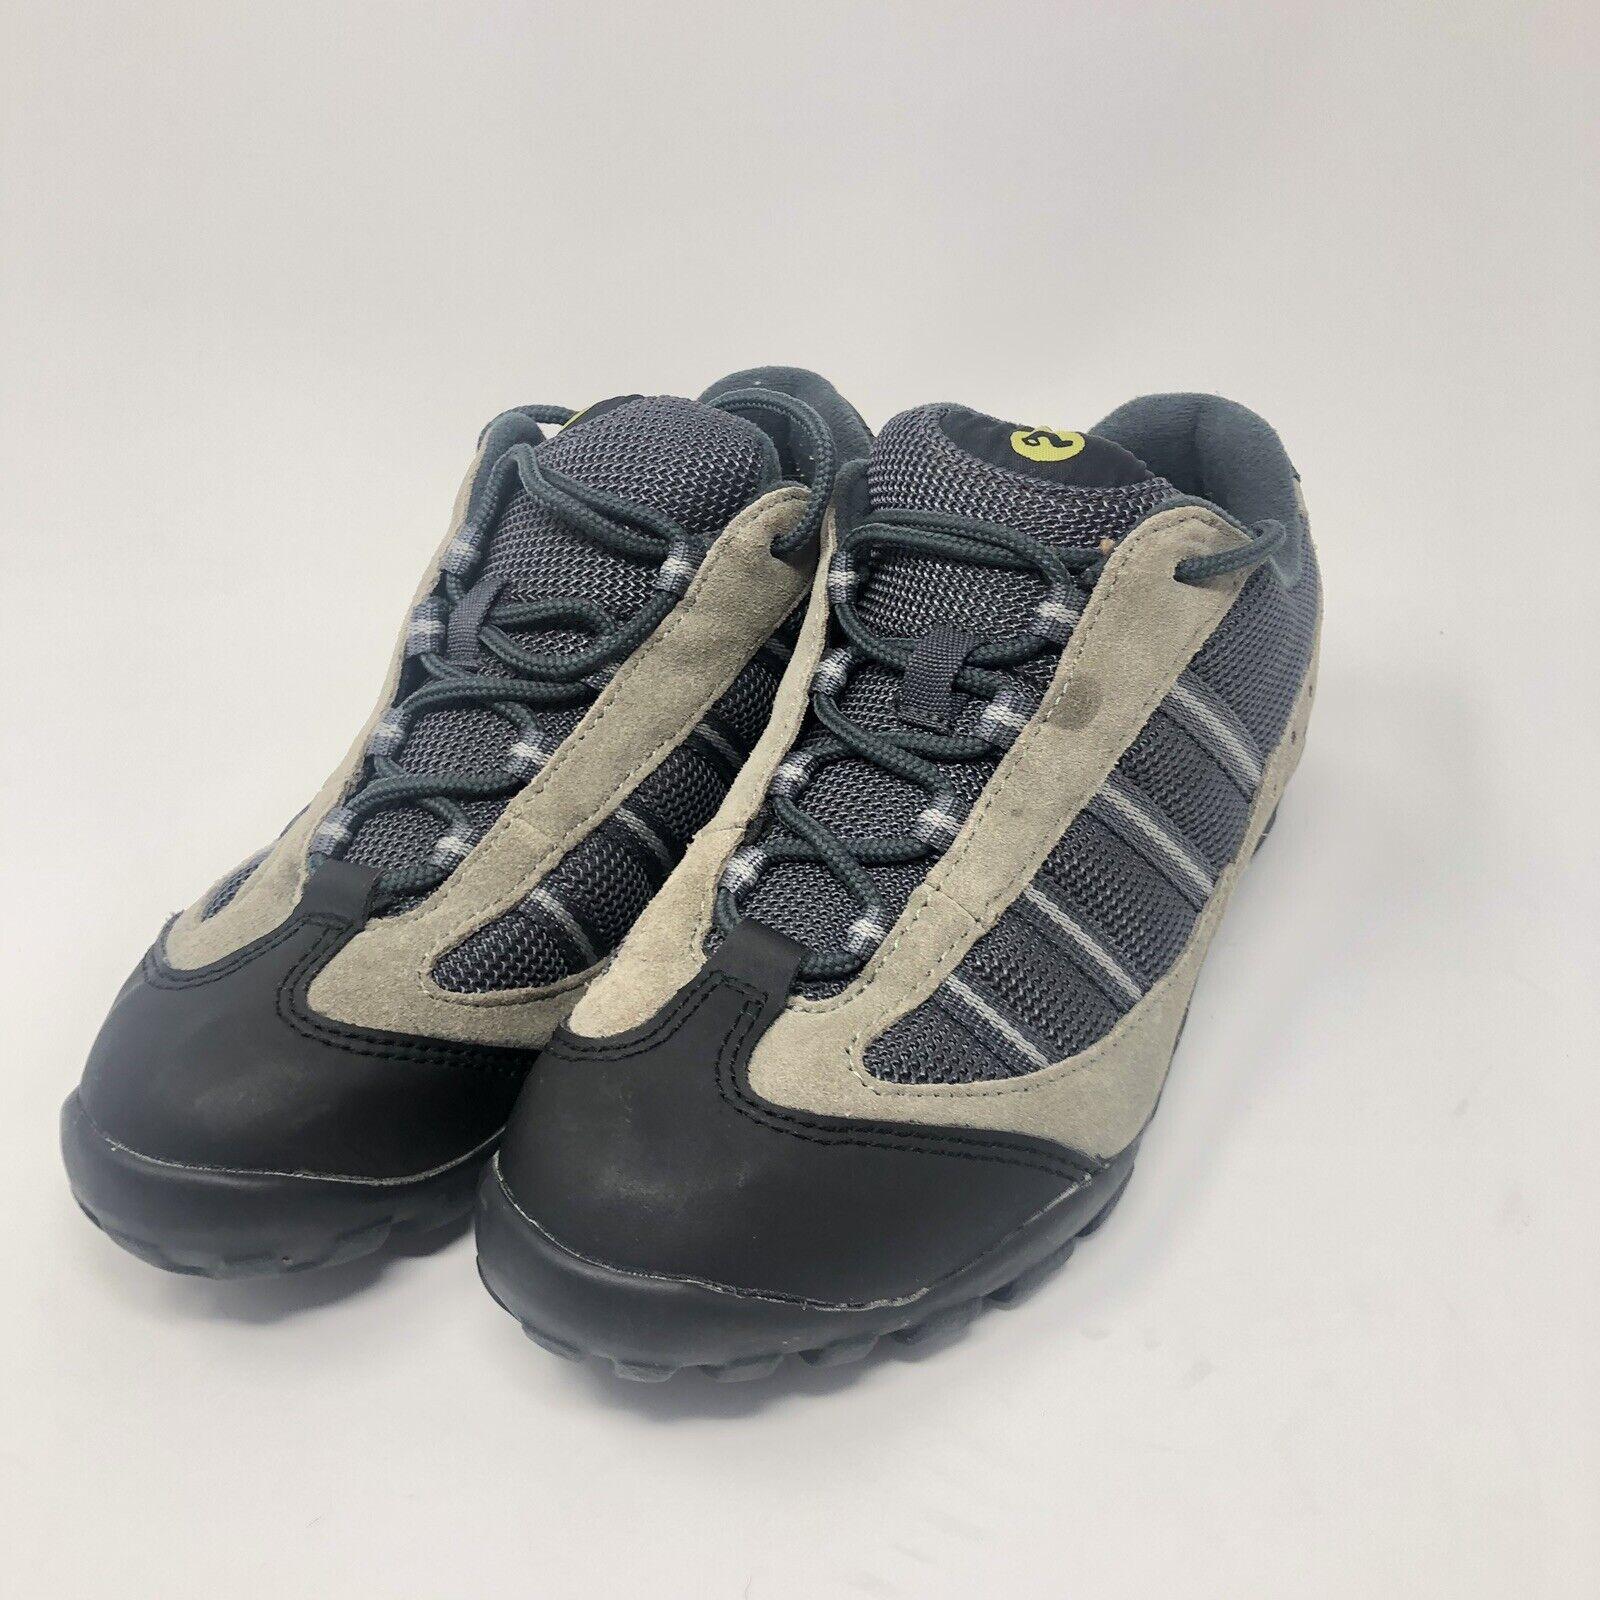 Shimano Men's SHM021G Sport Mountain Biking scarpe Dimensione 7 Marronee Like New